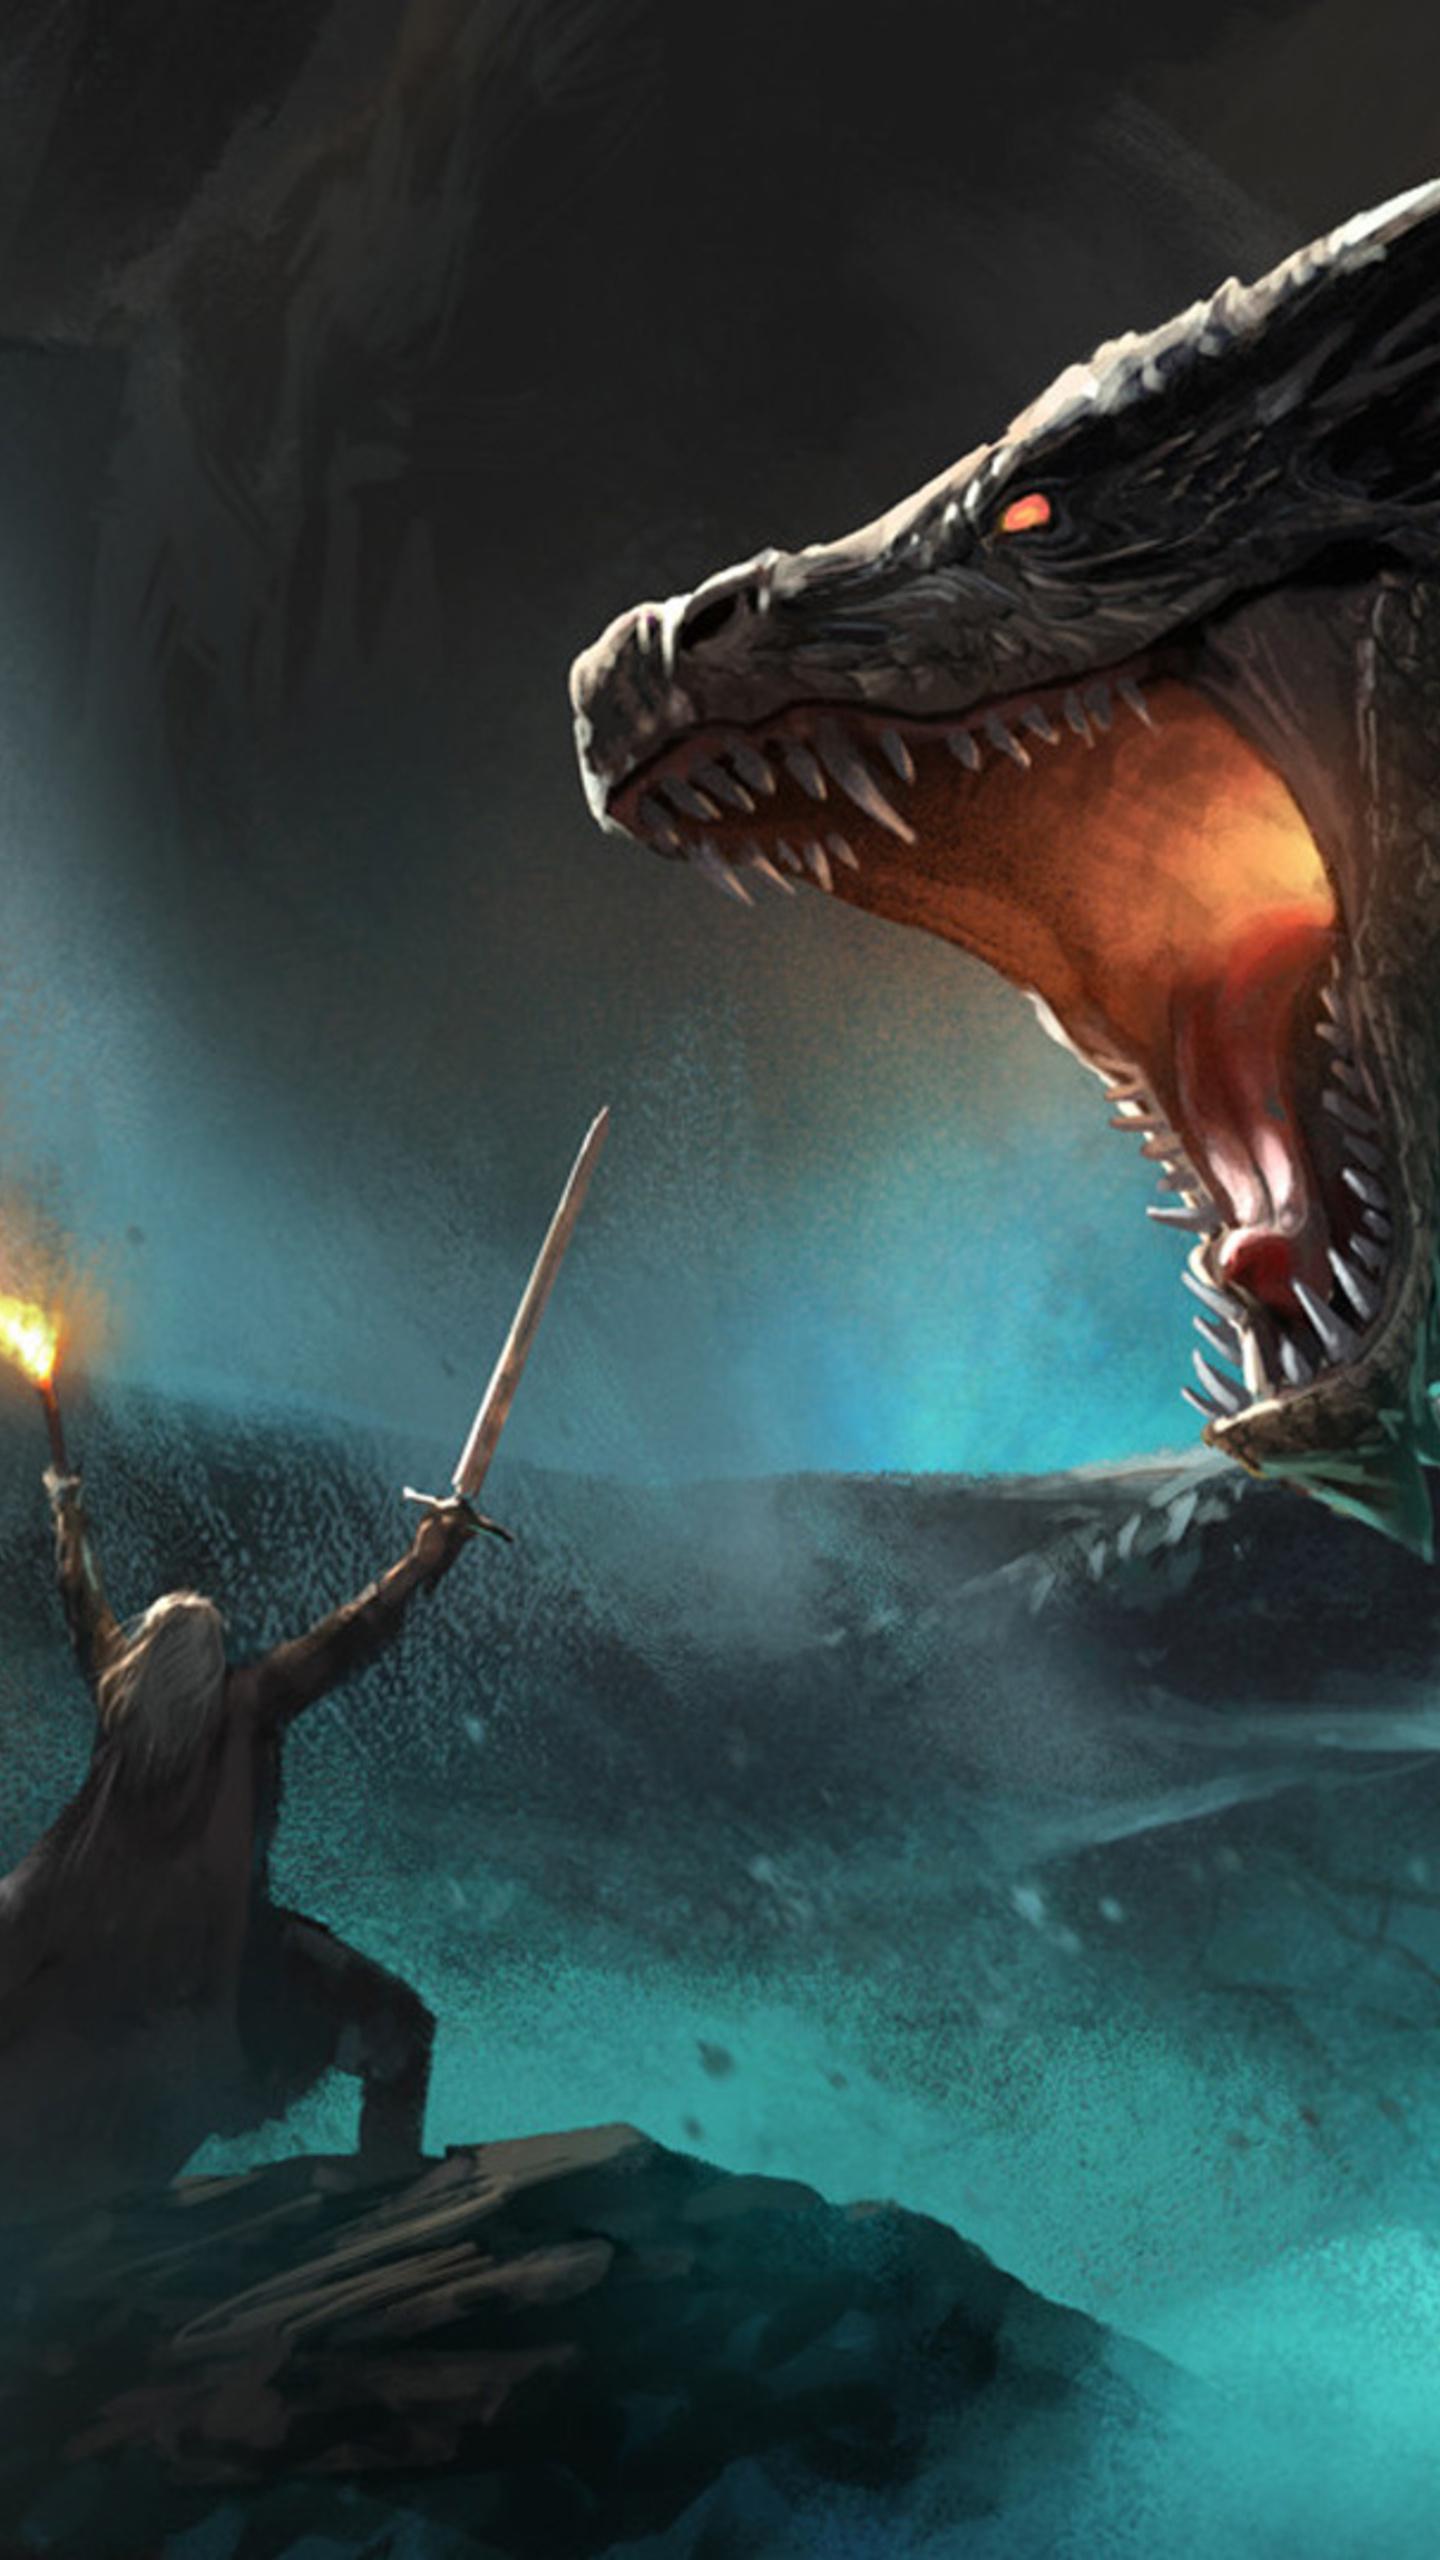 dragon-vs-warrior-artwork-jq.jpg